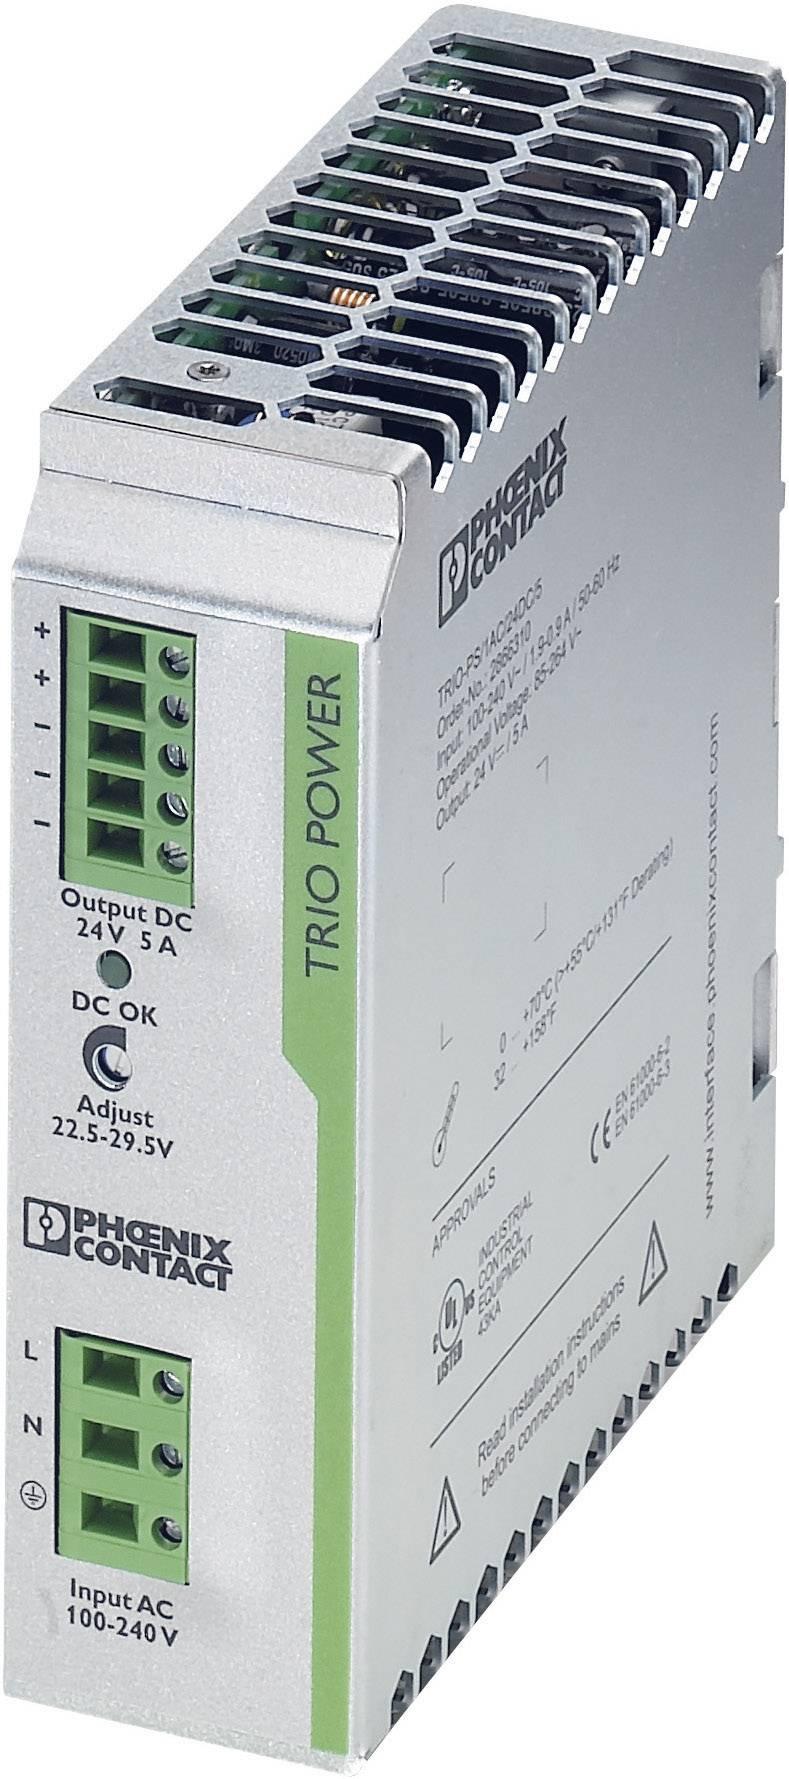 Sieťový zdroj na montážnu lištu (DIN lištu) Phoenix Contact TRIO-PS/1AC/24DC/5, 1 x, 24 V/DC, 5 A, 120 W